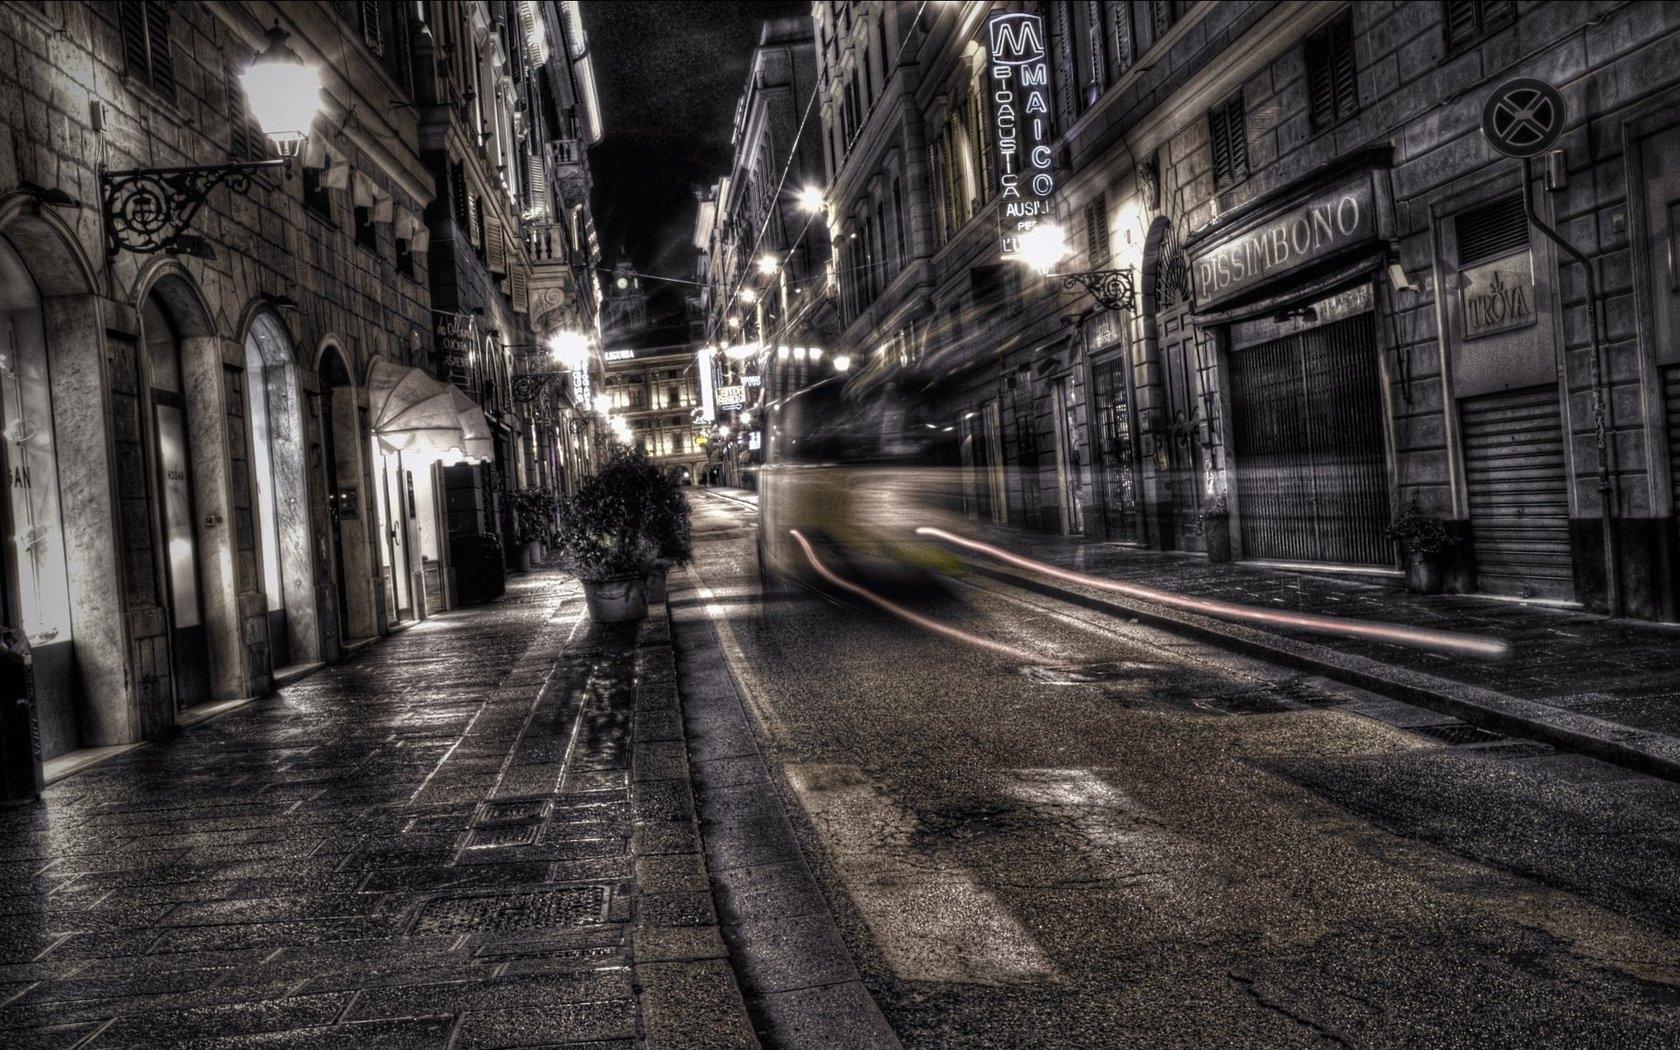 dark city street background 9831 | background check all